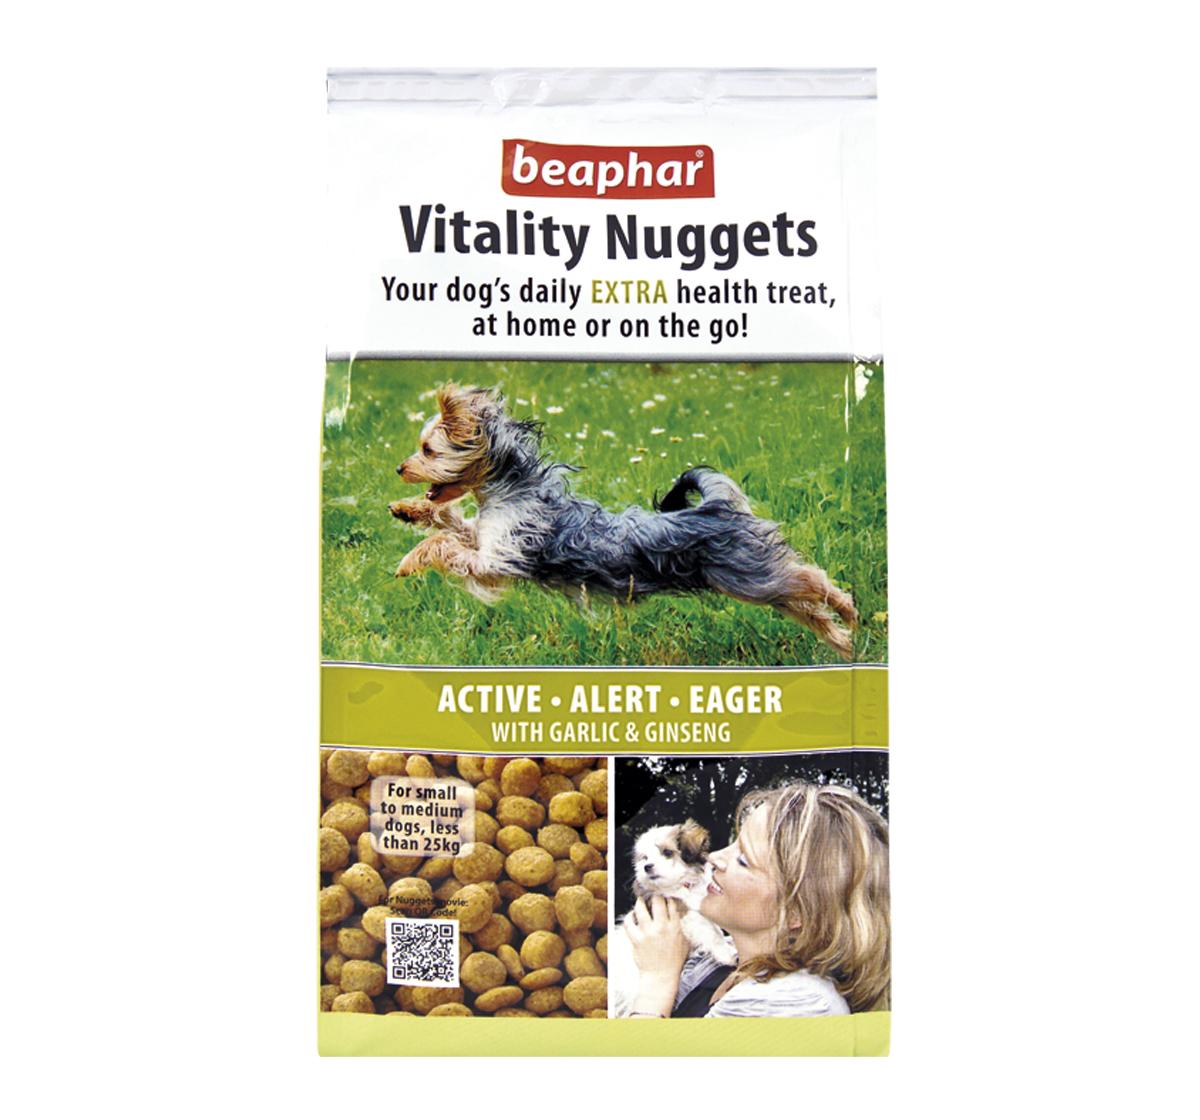 Beaphar Vitality Nuggets - 300 Gm